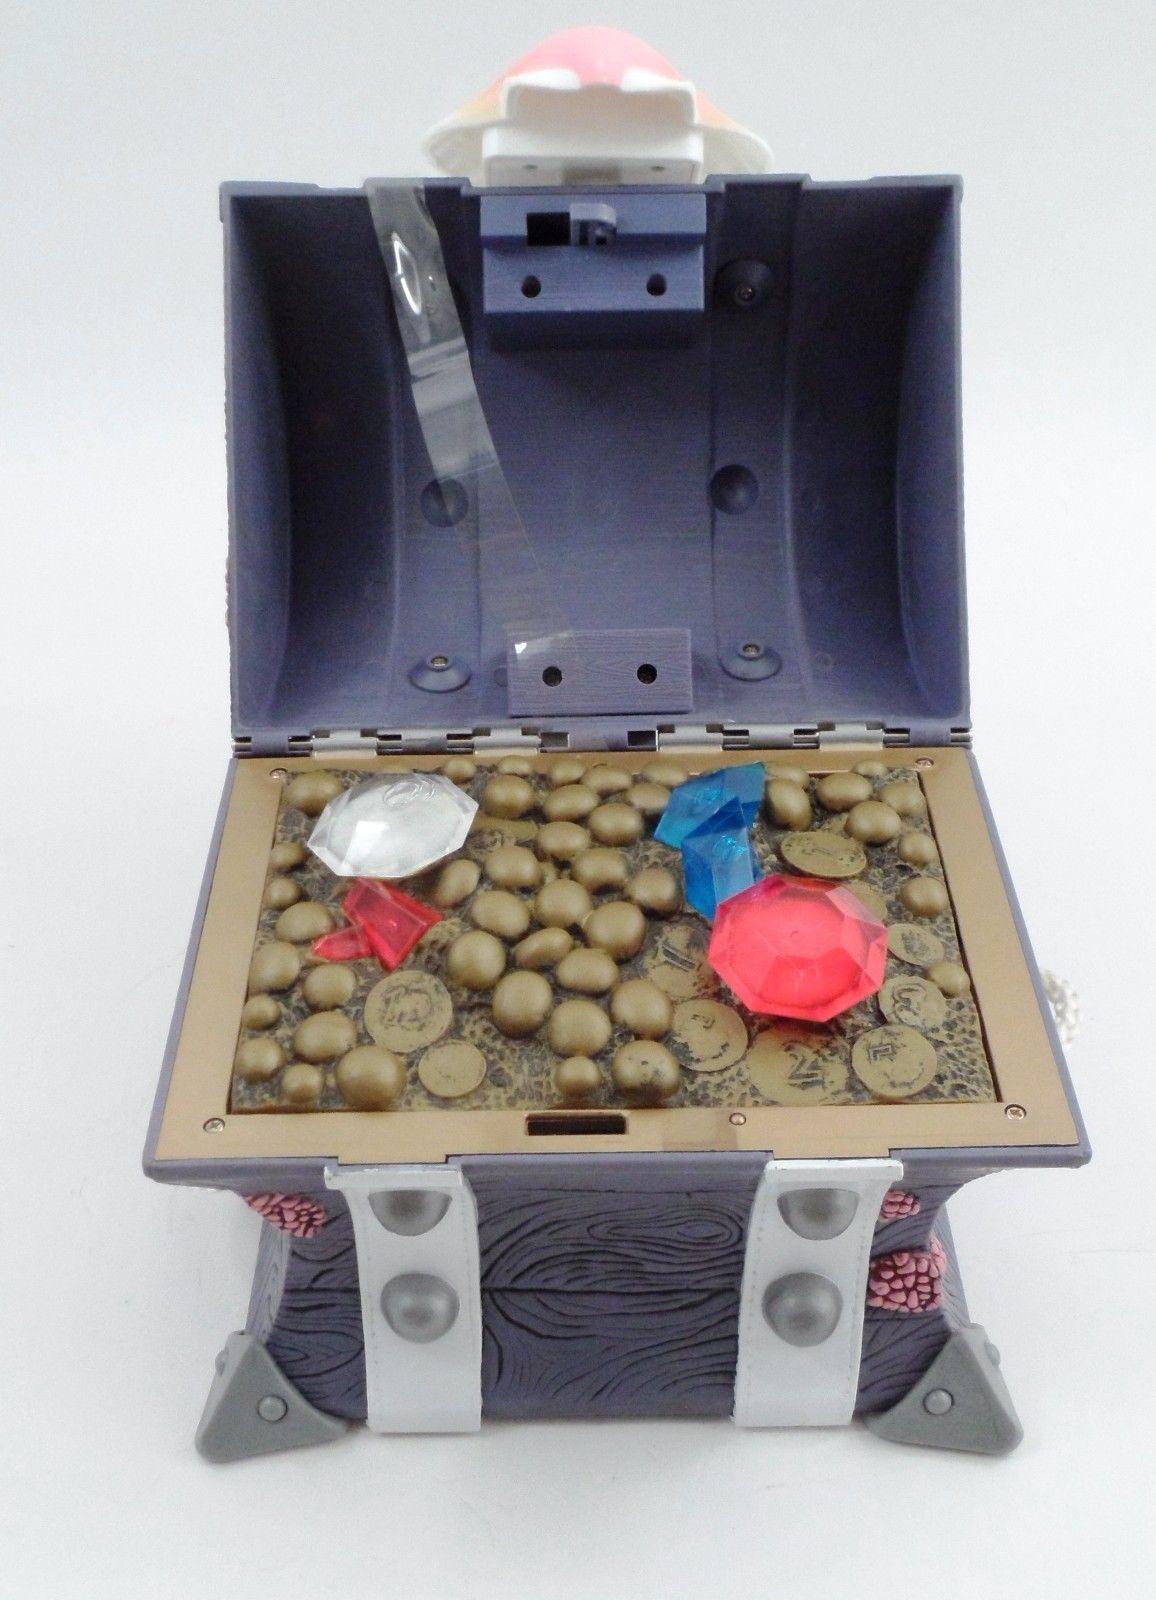 NWOB 2001 ParentBanc Talking Little Mermaid Hidden Treasure Chest Box Bank WORKS